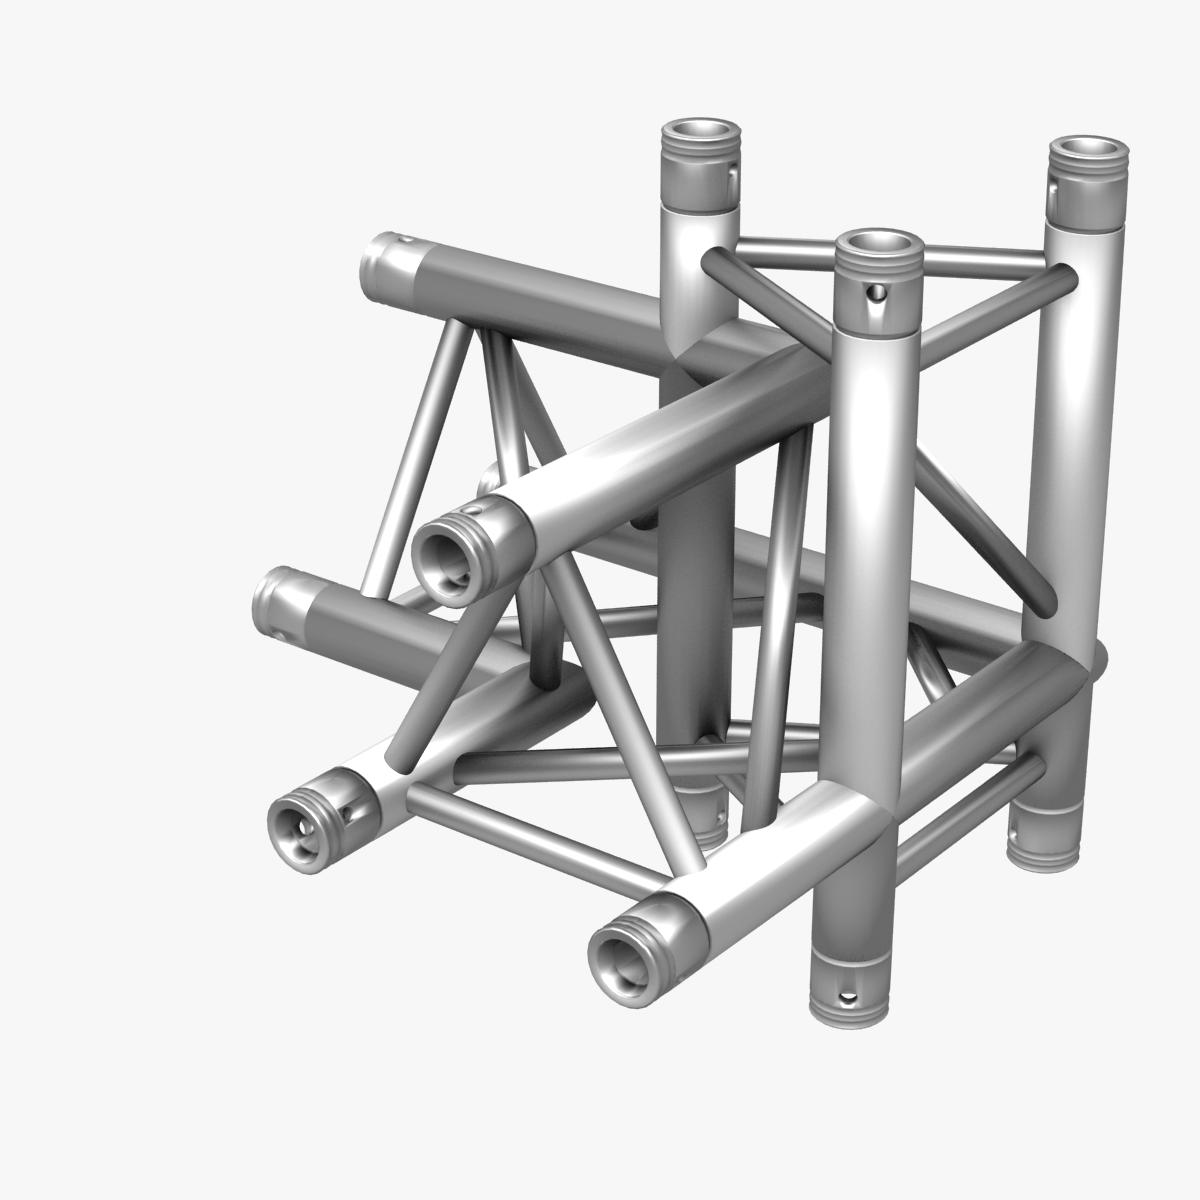 Triangular Truss Corner Junction 102 3d model 3ds max dxf fbx b3d c4d  obj other 268936